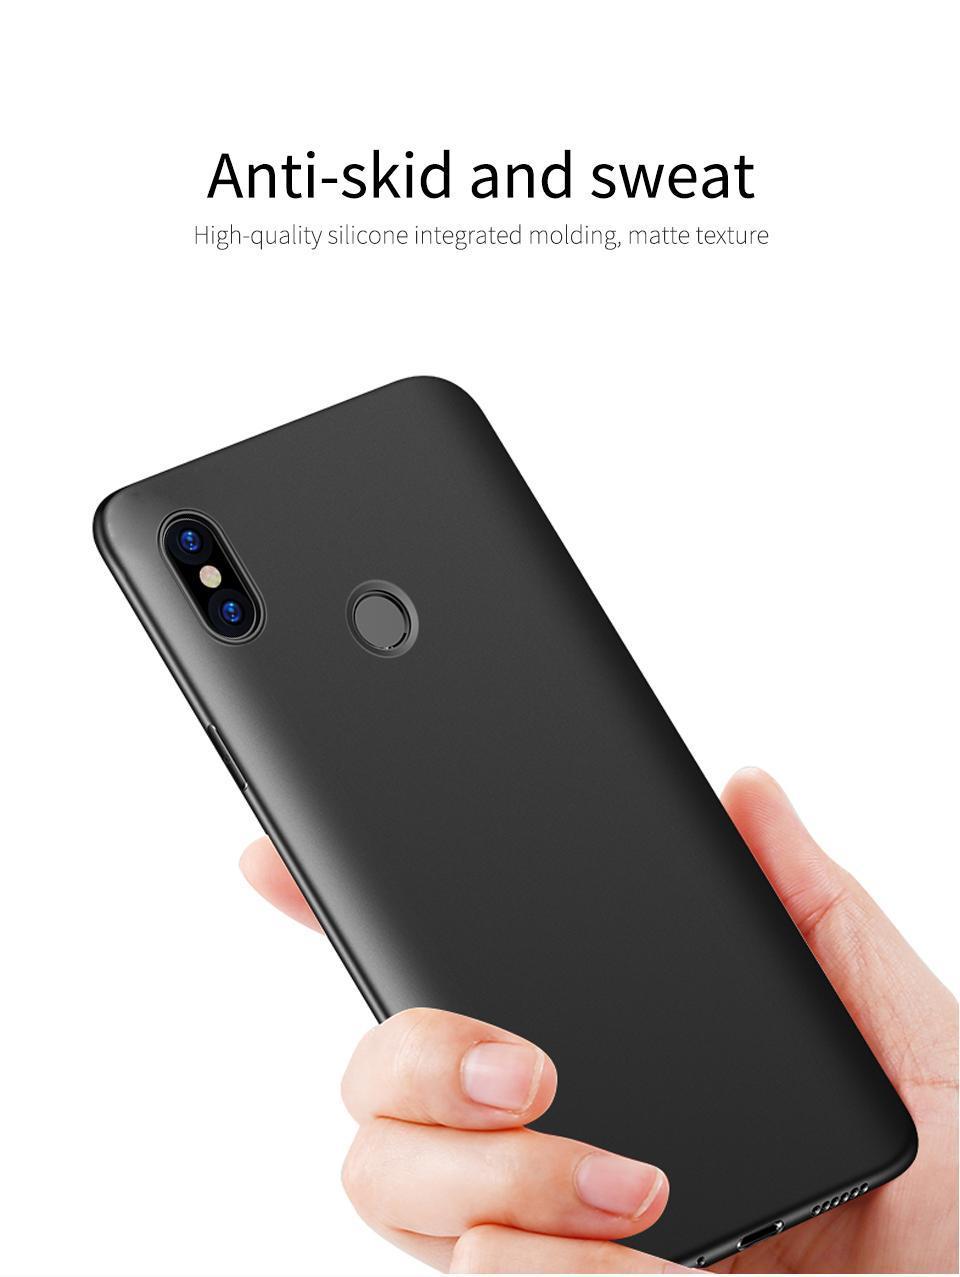 ... Caselova UltraSlim Black Matte Hybrid Case for Xiaomi Redmi S2 - Black + Gratis Camera Protector ...